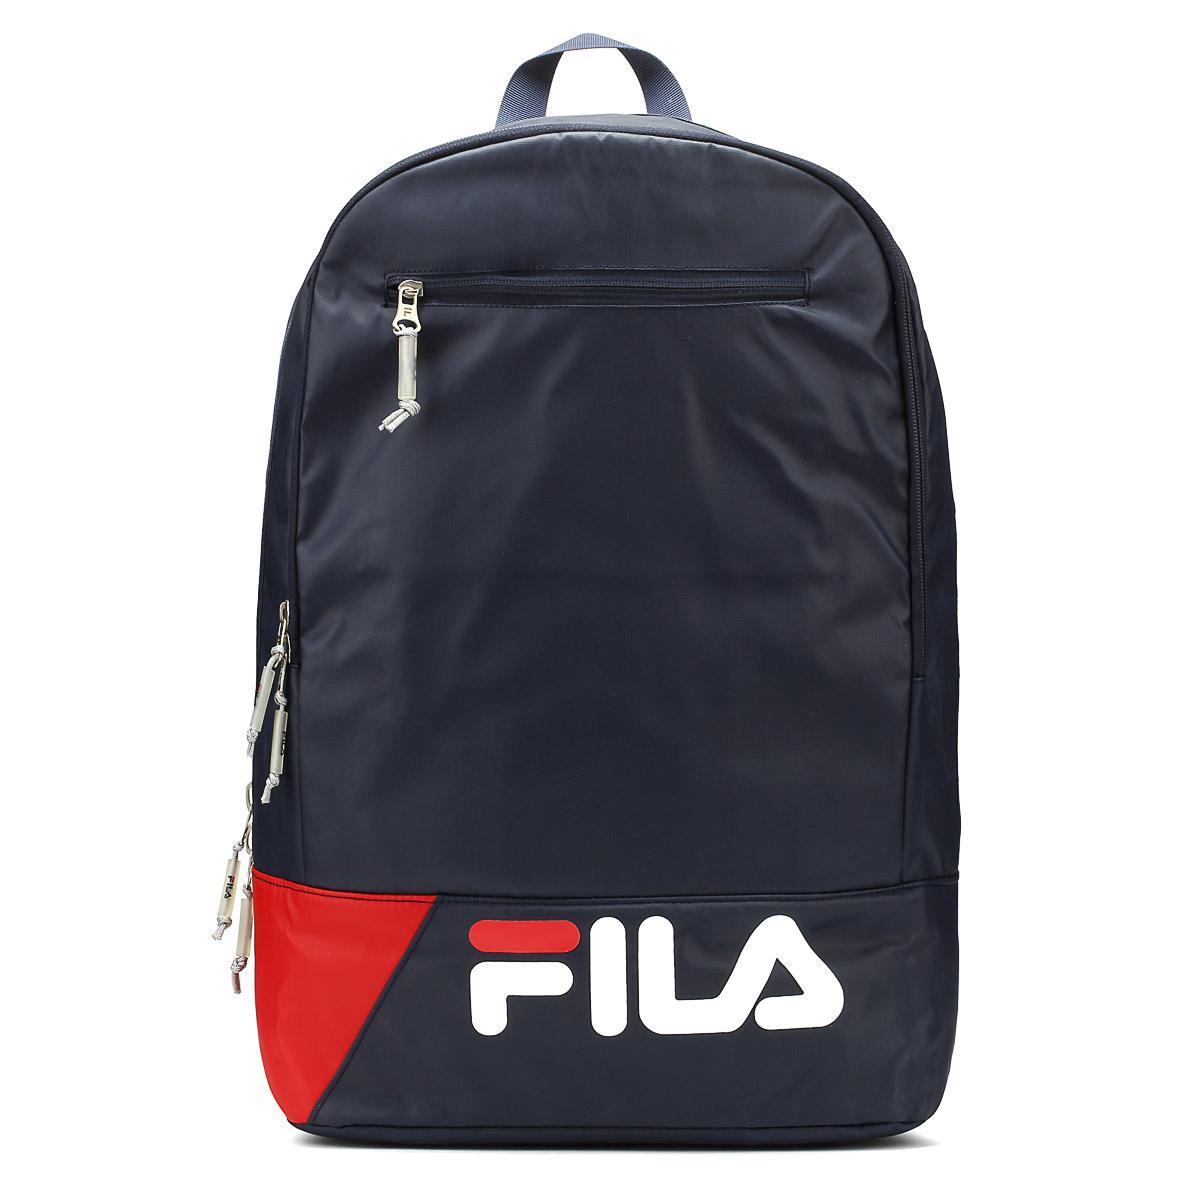 2dda390973 Fila - Peacoat Blue   Chinese Red   White Barbe Backpack for Men - Lyst